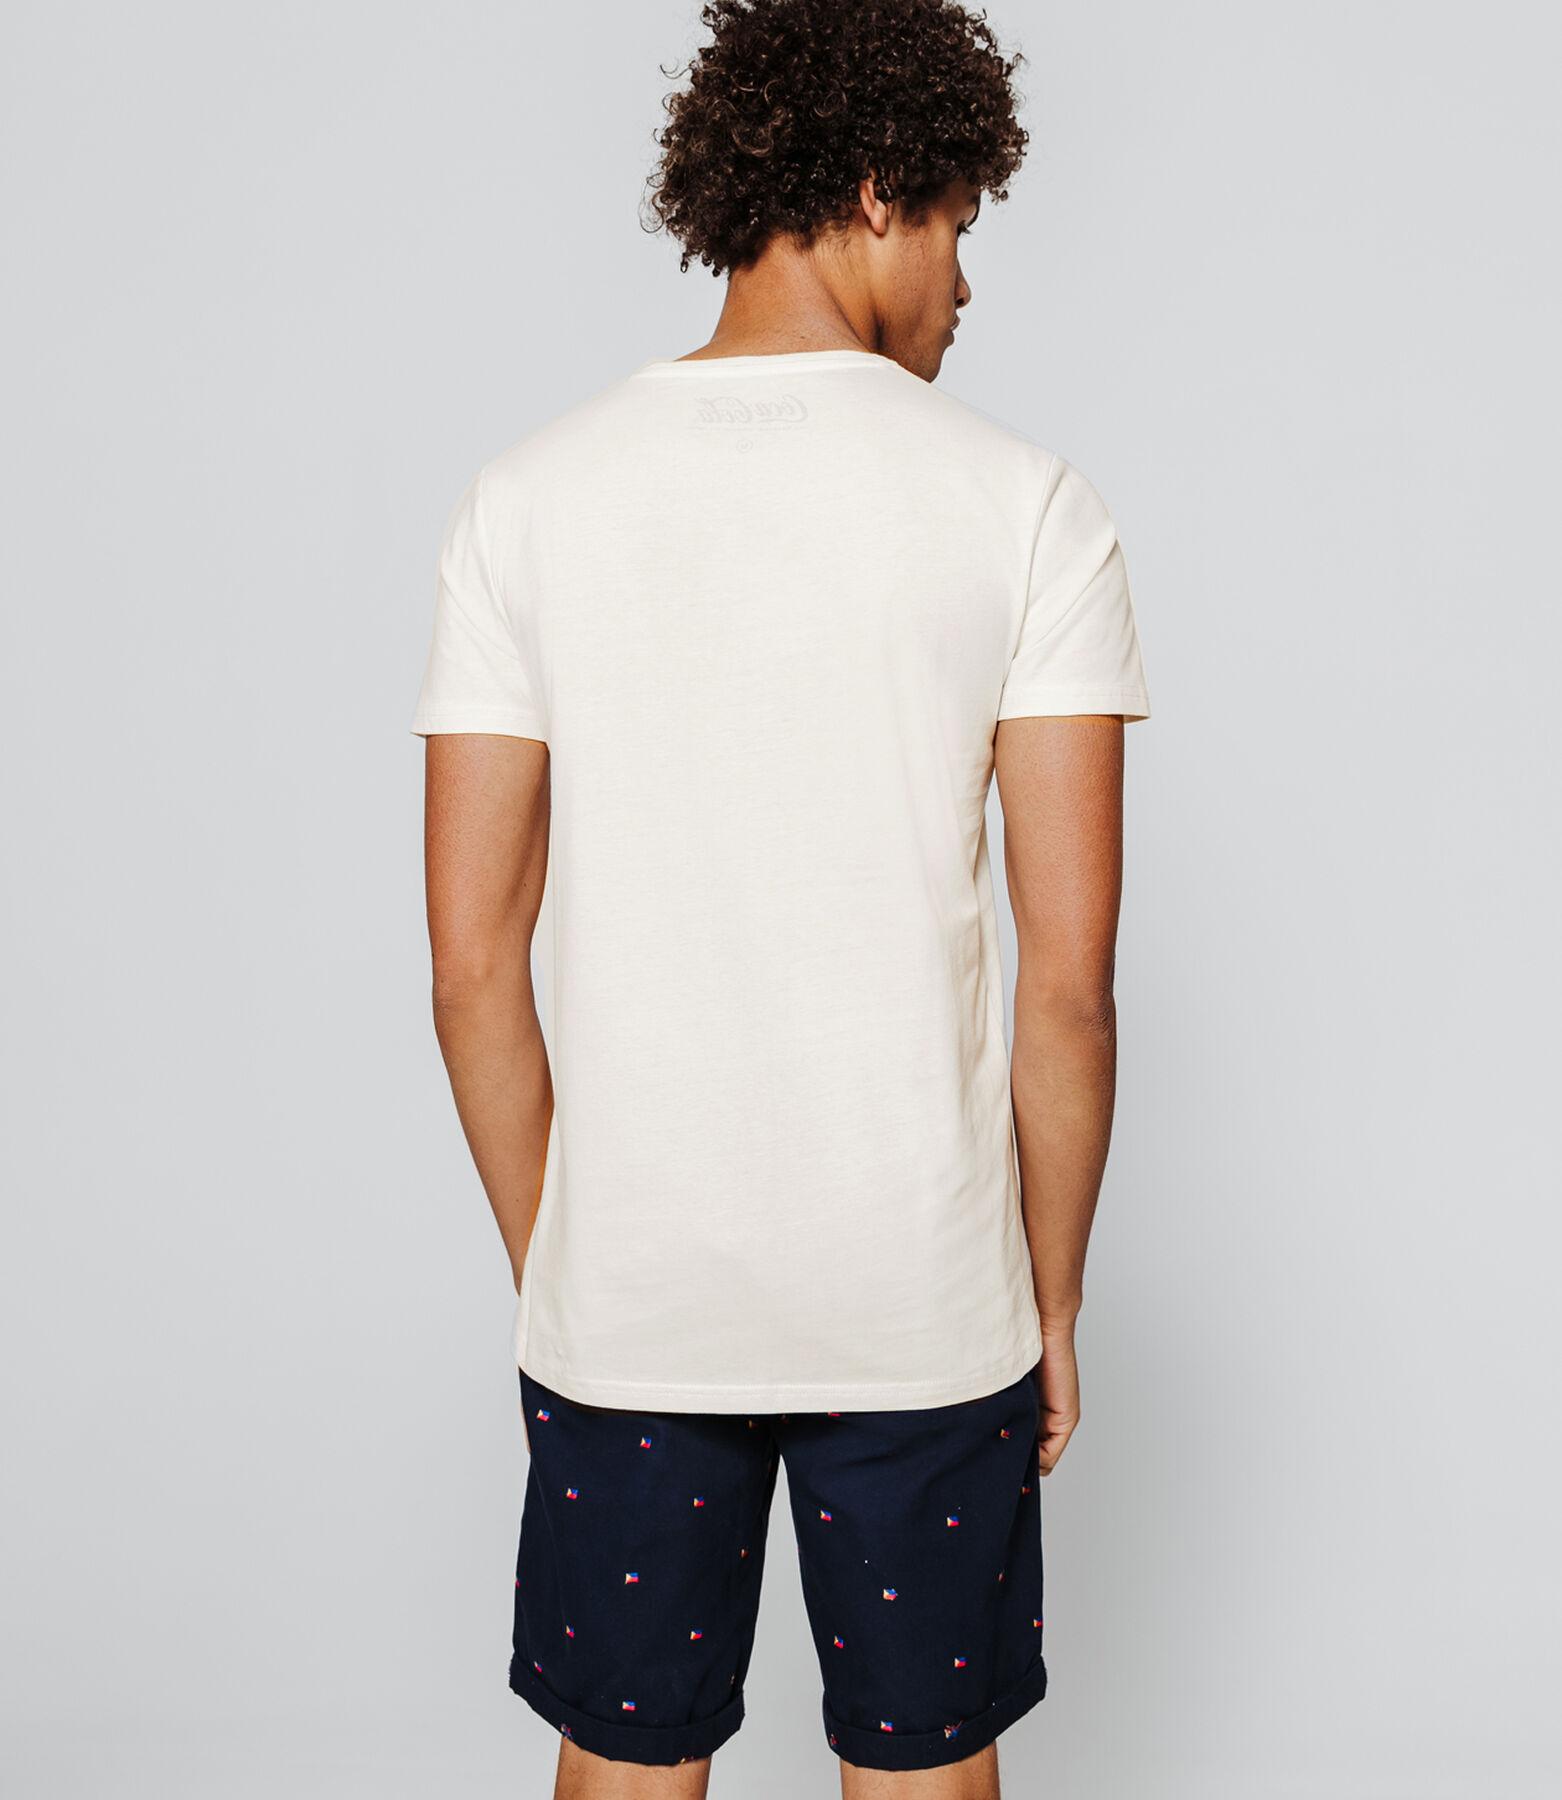 T-shirt Licence Fanta